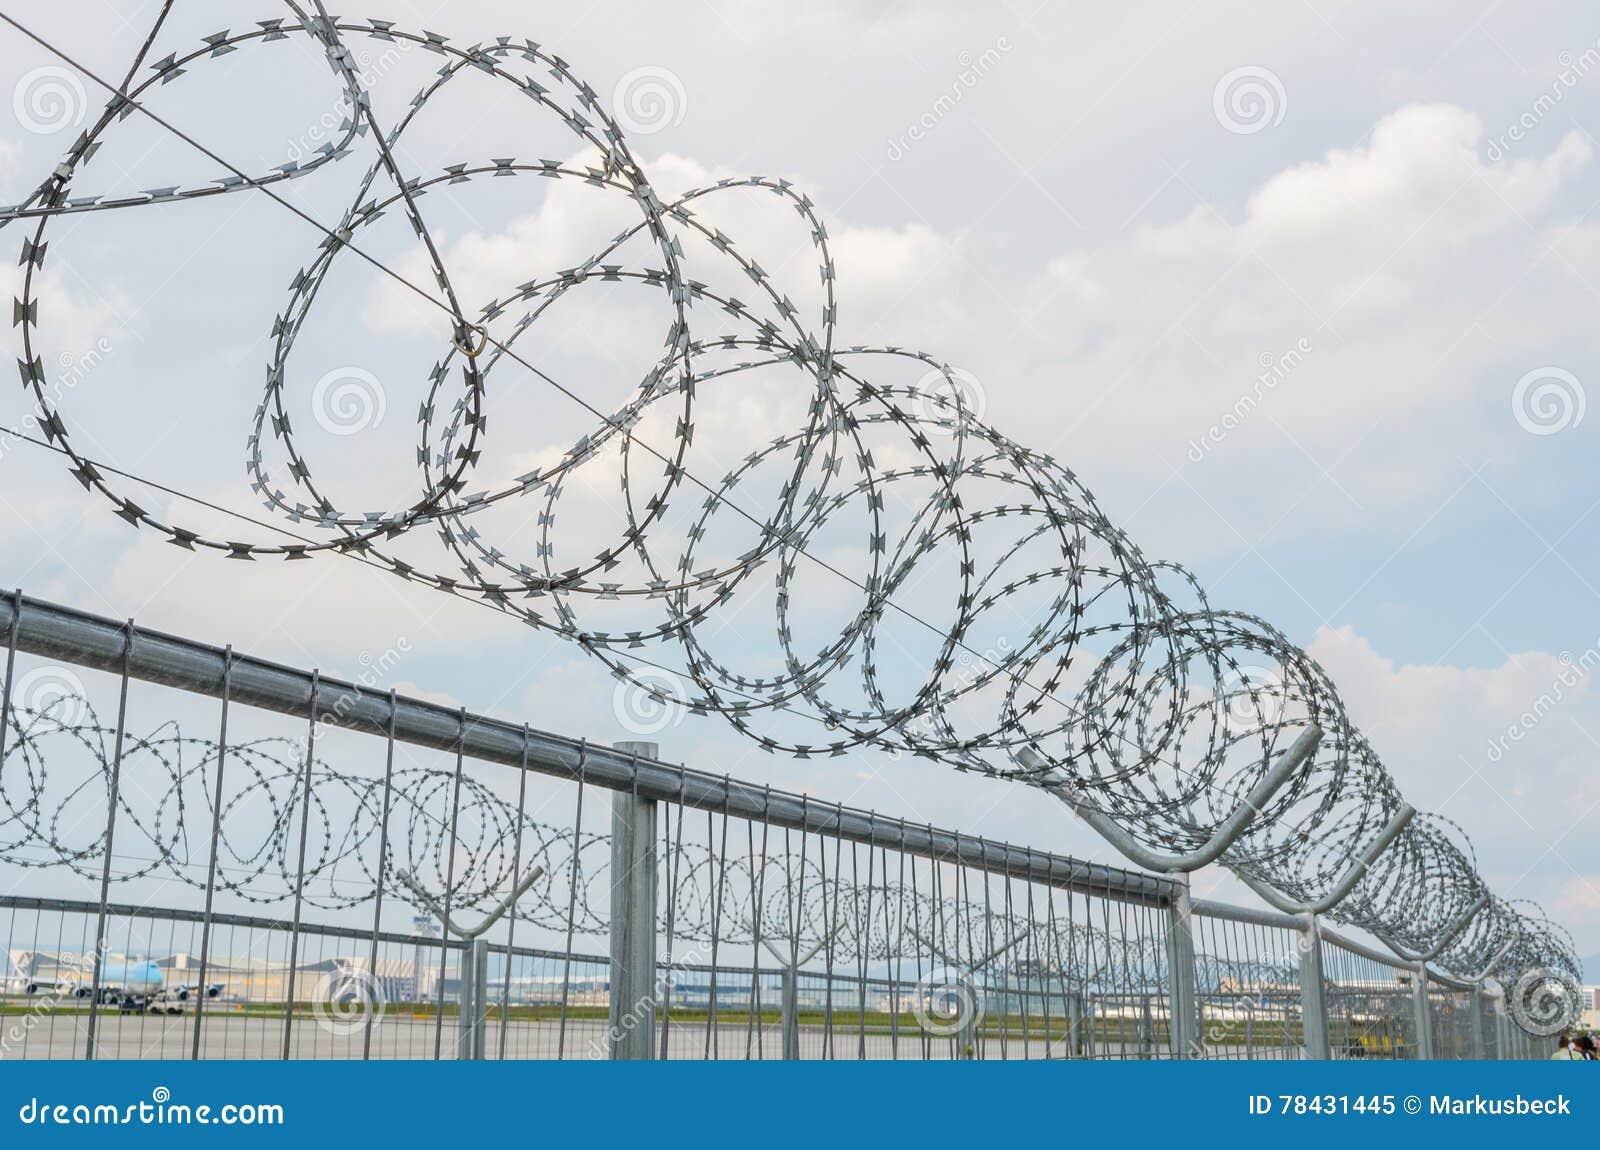 cyclone fence stock image image of crime abstract frankfurt